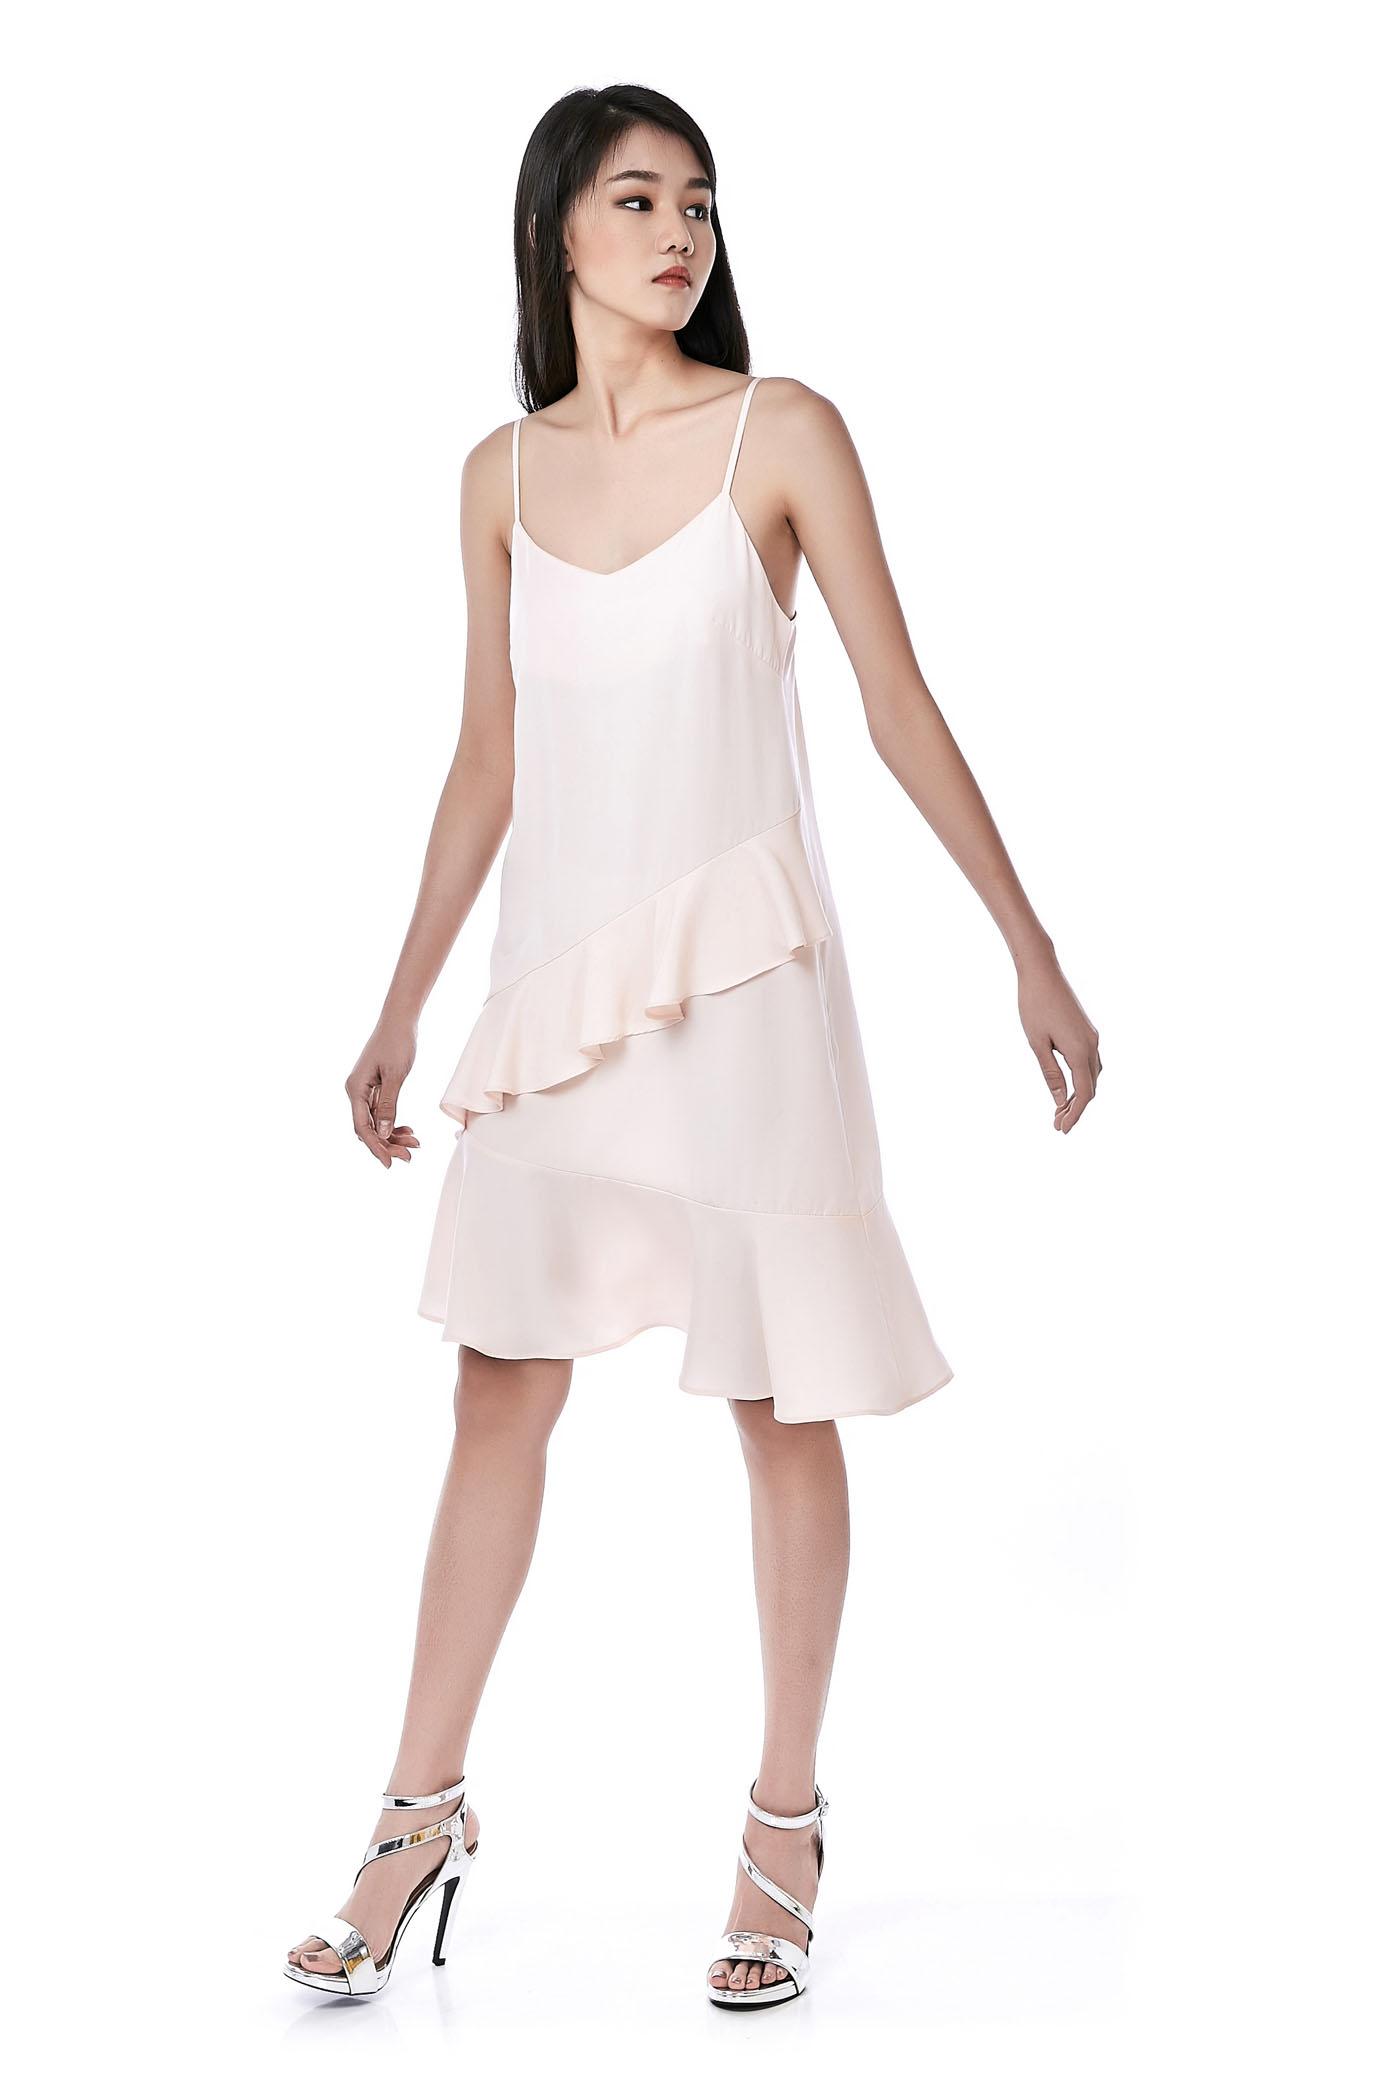 Fraunia Ruffle-trim Midi Dress